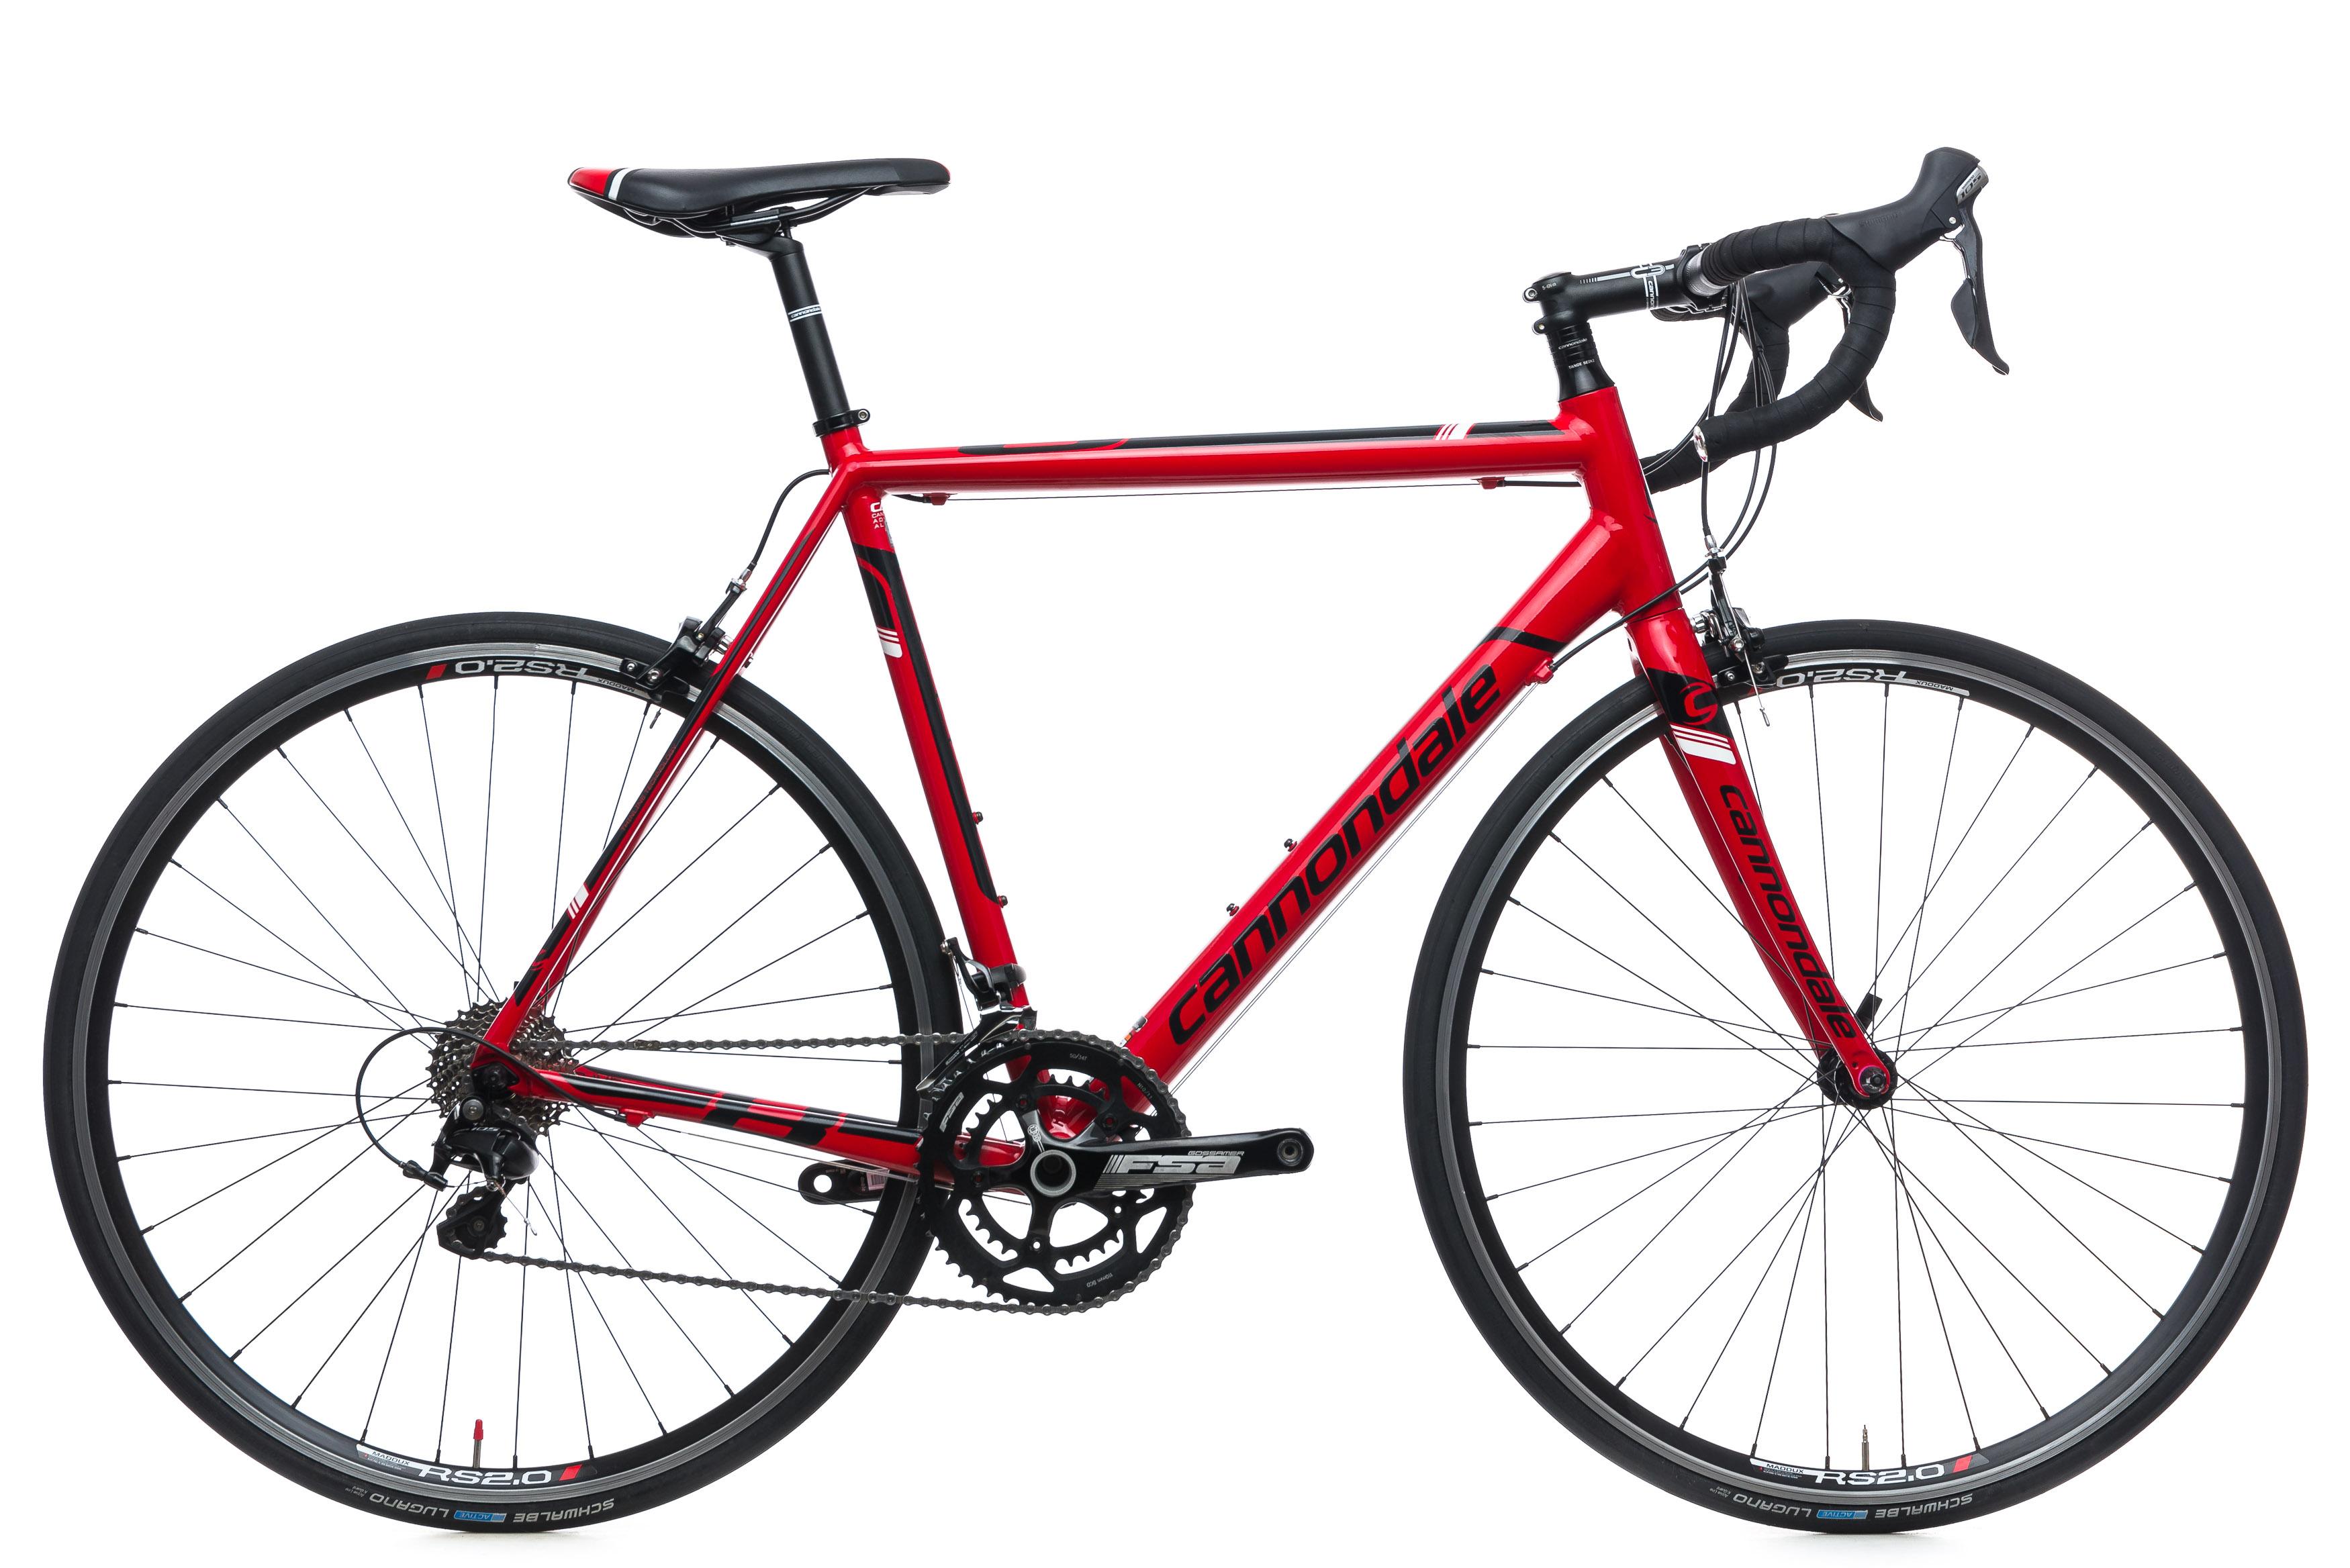 847c7ffbabf 2016 Cannondale CAAD 8 105 Road Bike 56cm Large Aluminum Shimano FSA ...